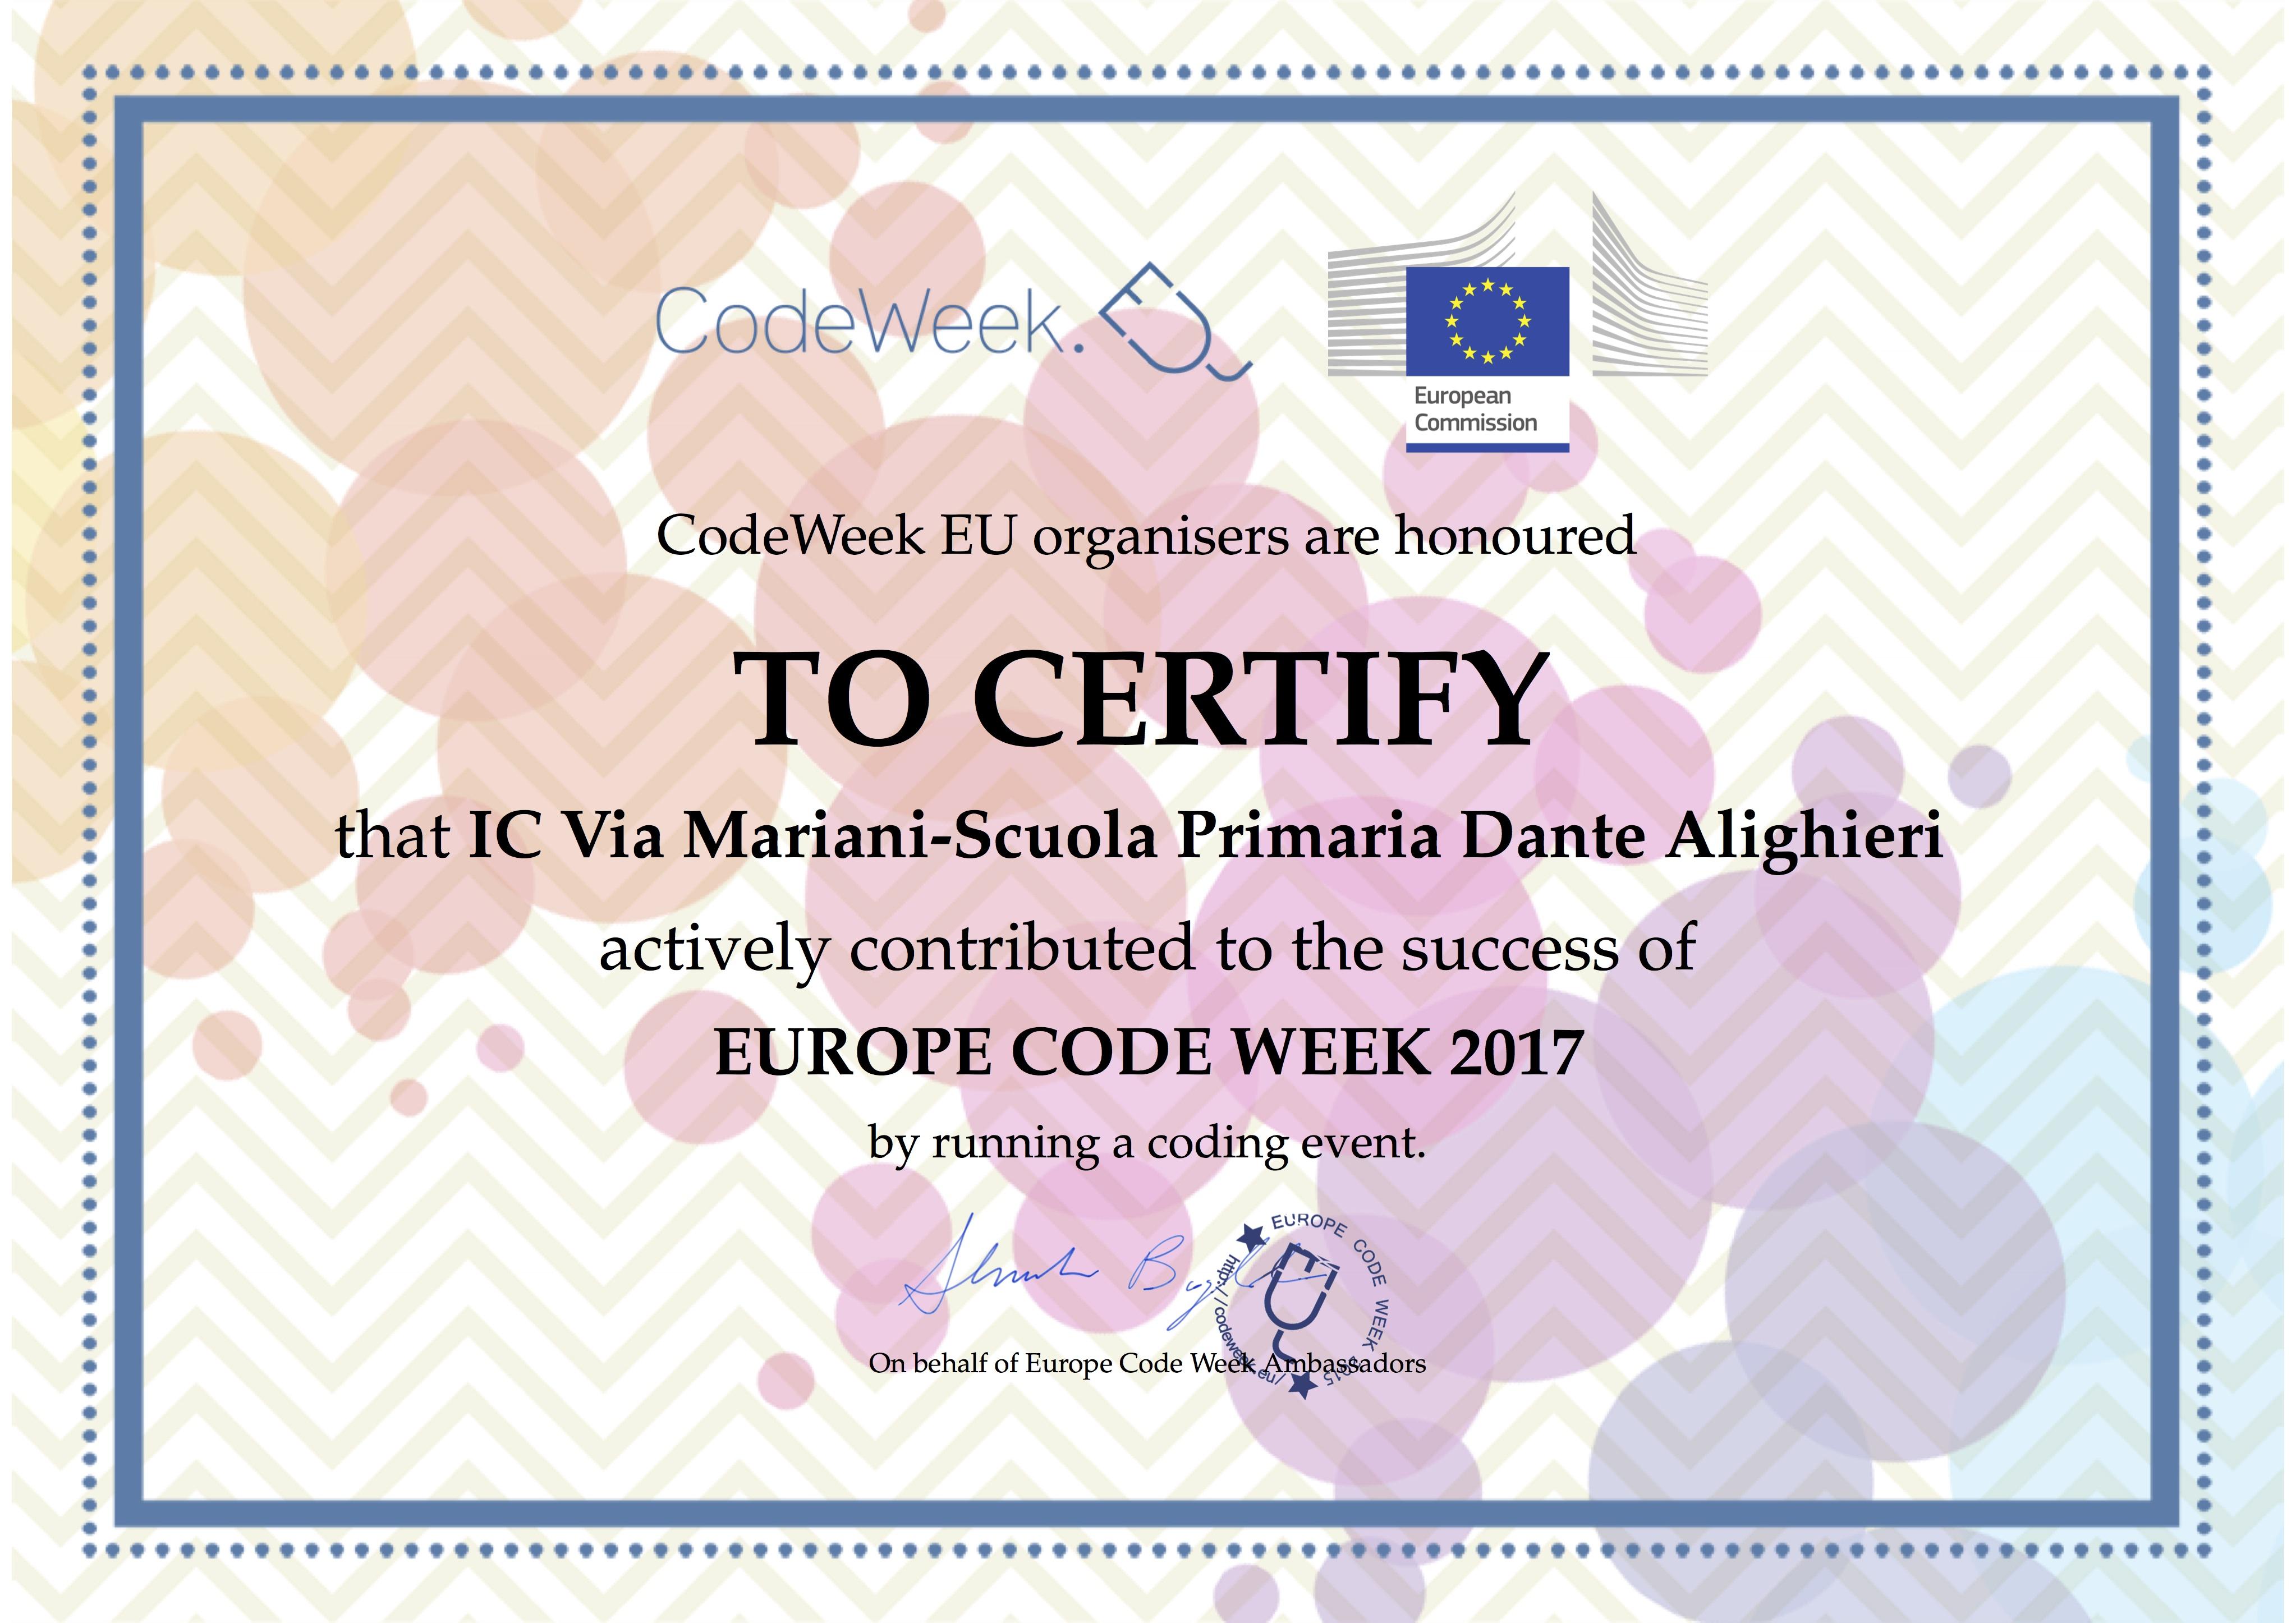 Attestato CodeWeek 2017 Dante